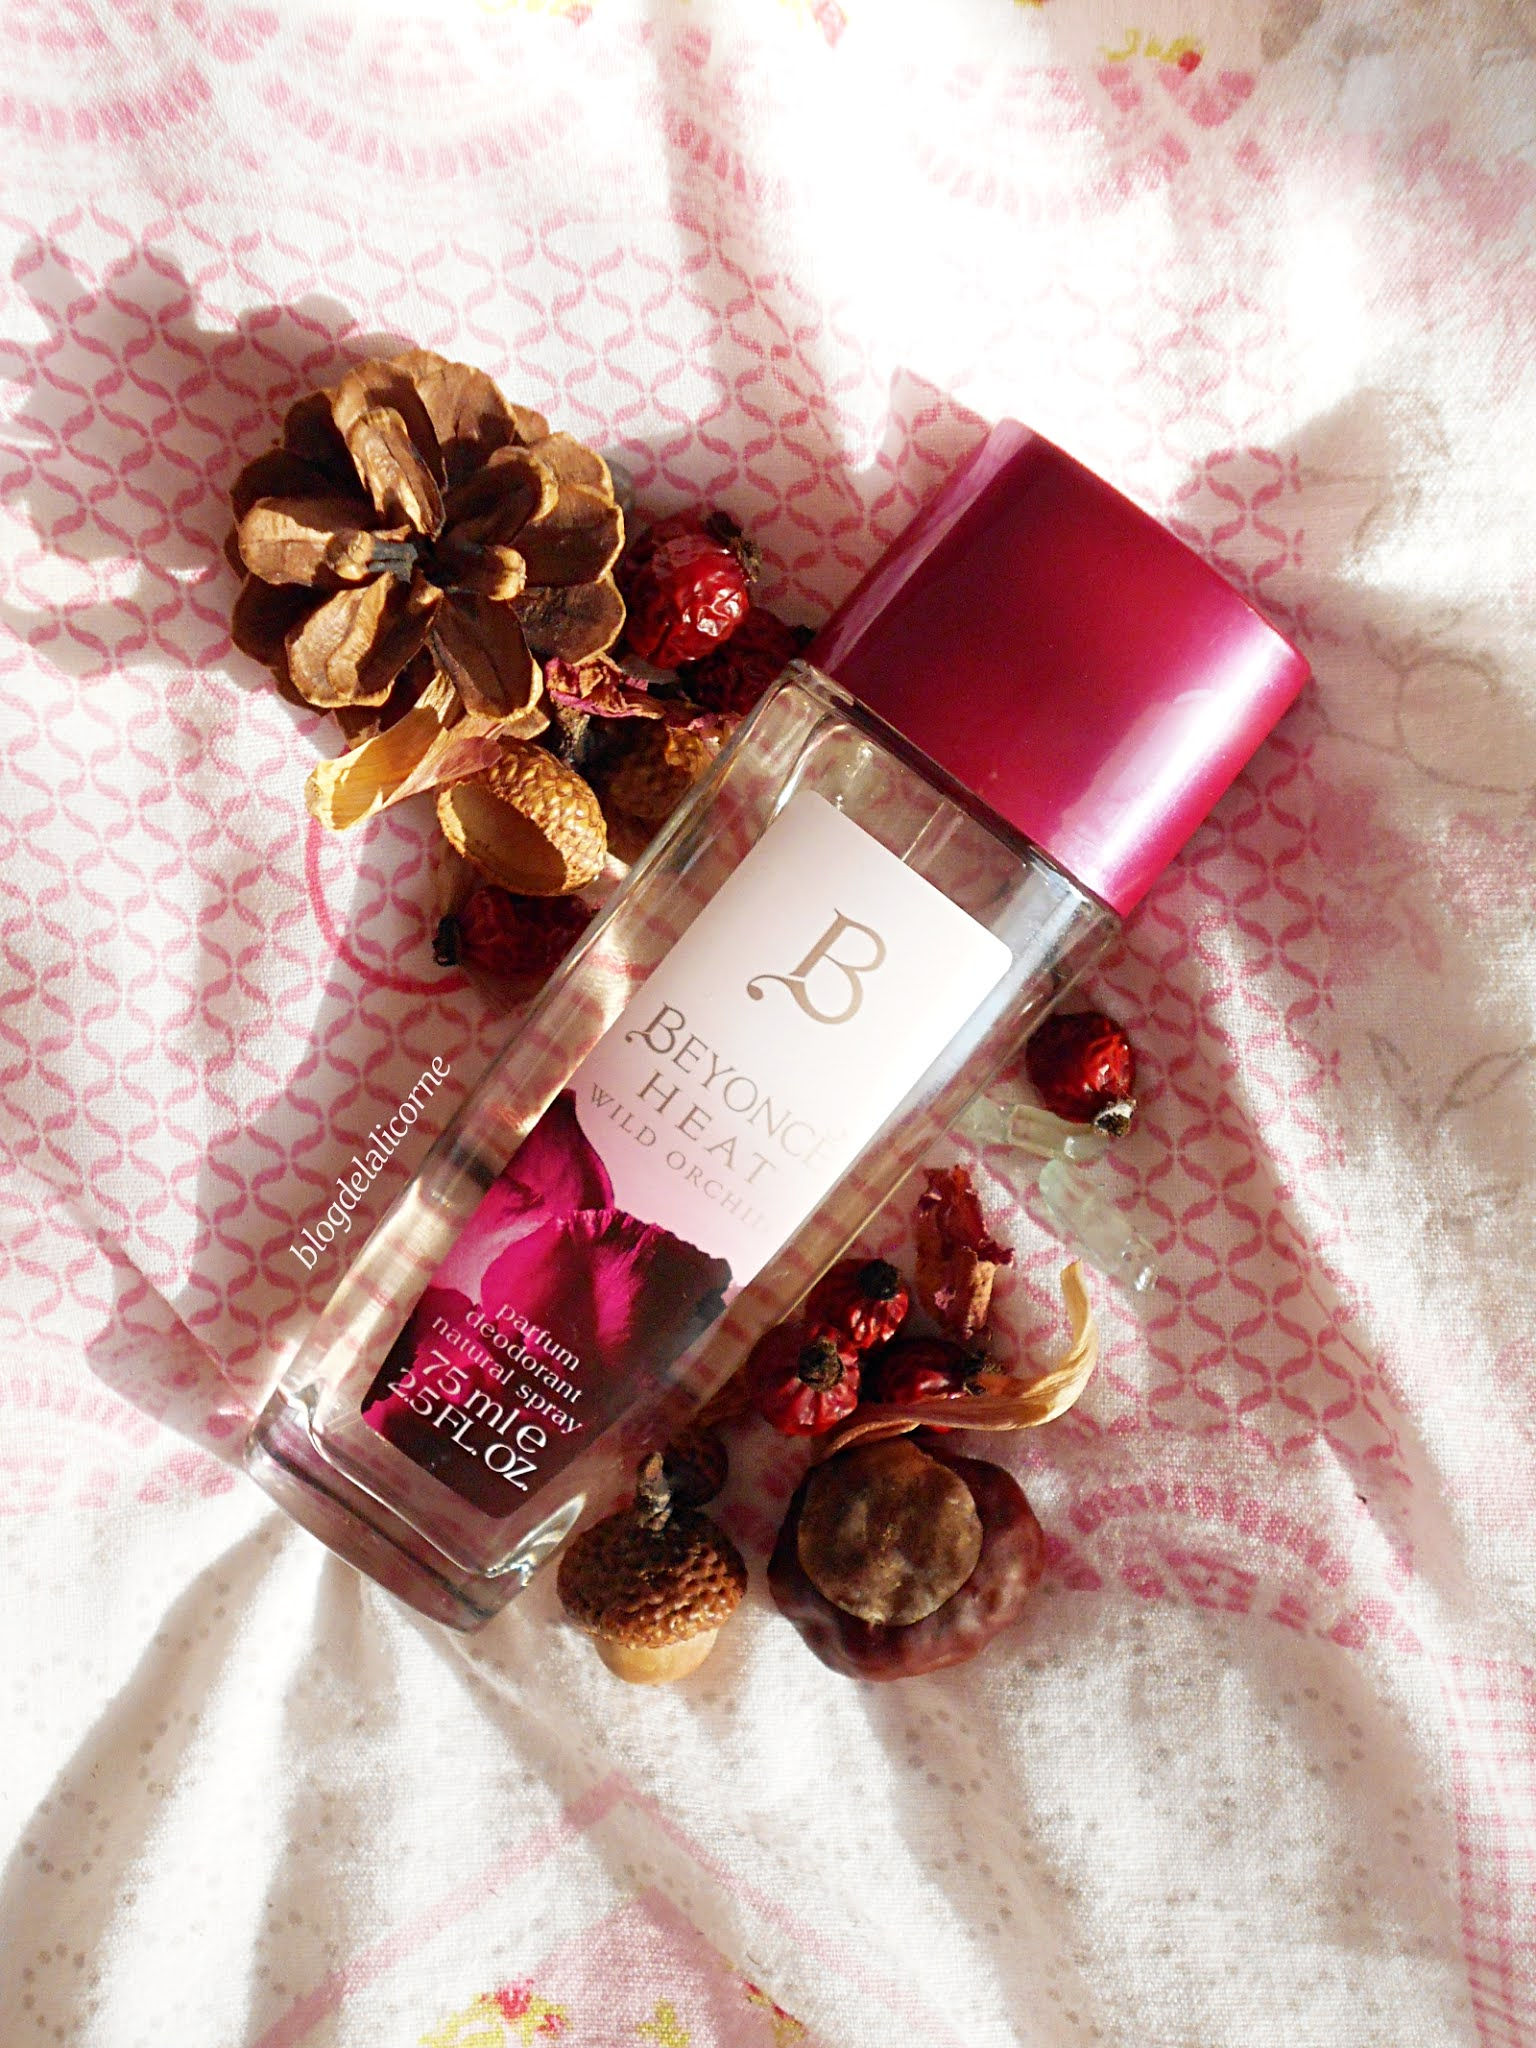 Beyonce Heat Wild Orchid dezodorant recenzia